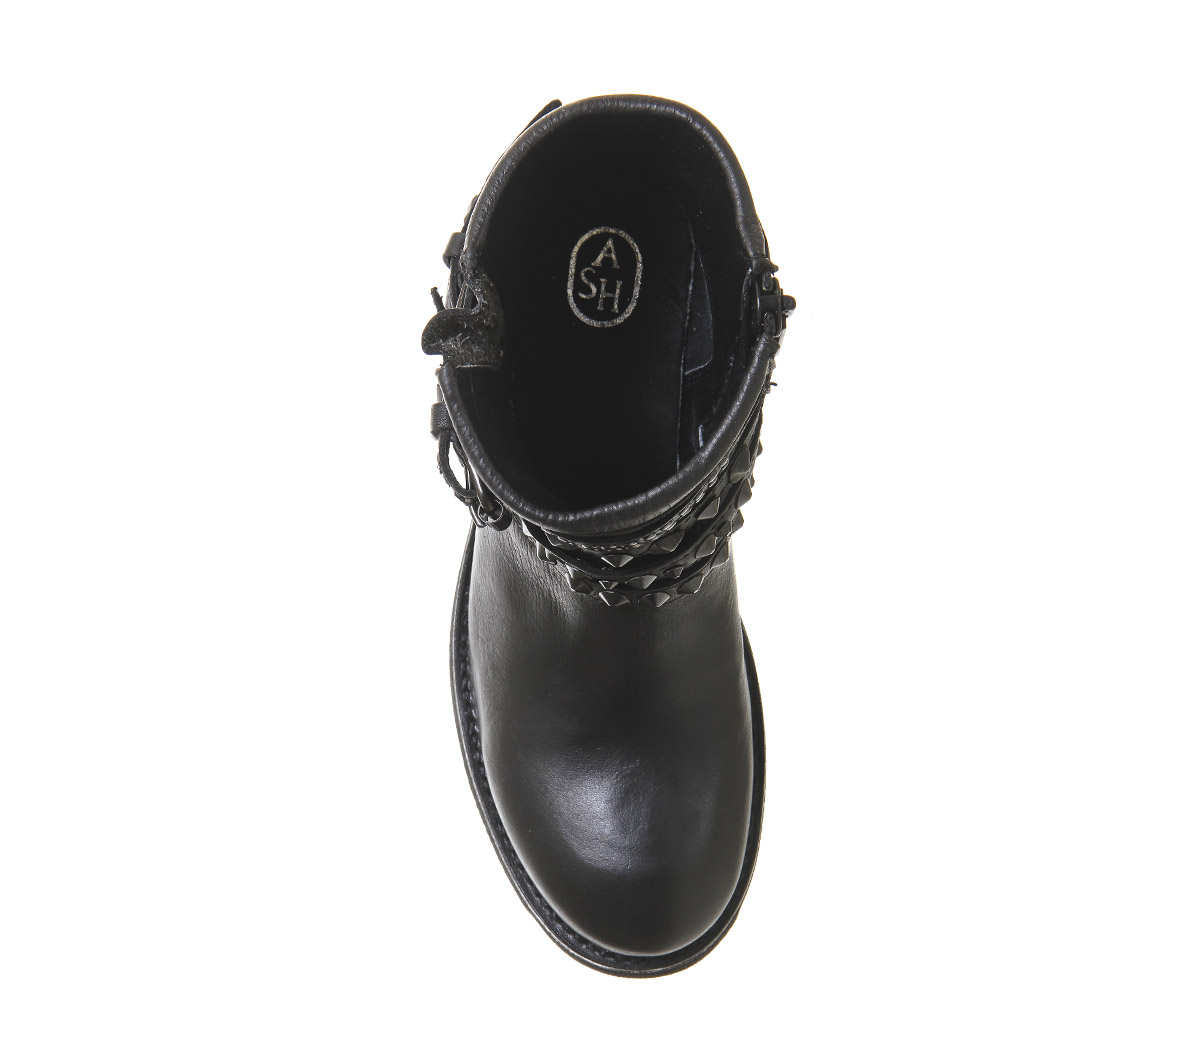 Womens Ash Tatum Biker LEATHER Boots BLACK NAPPA DESTROYER LEATHER Biker Boots 1948ca